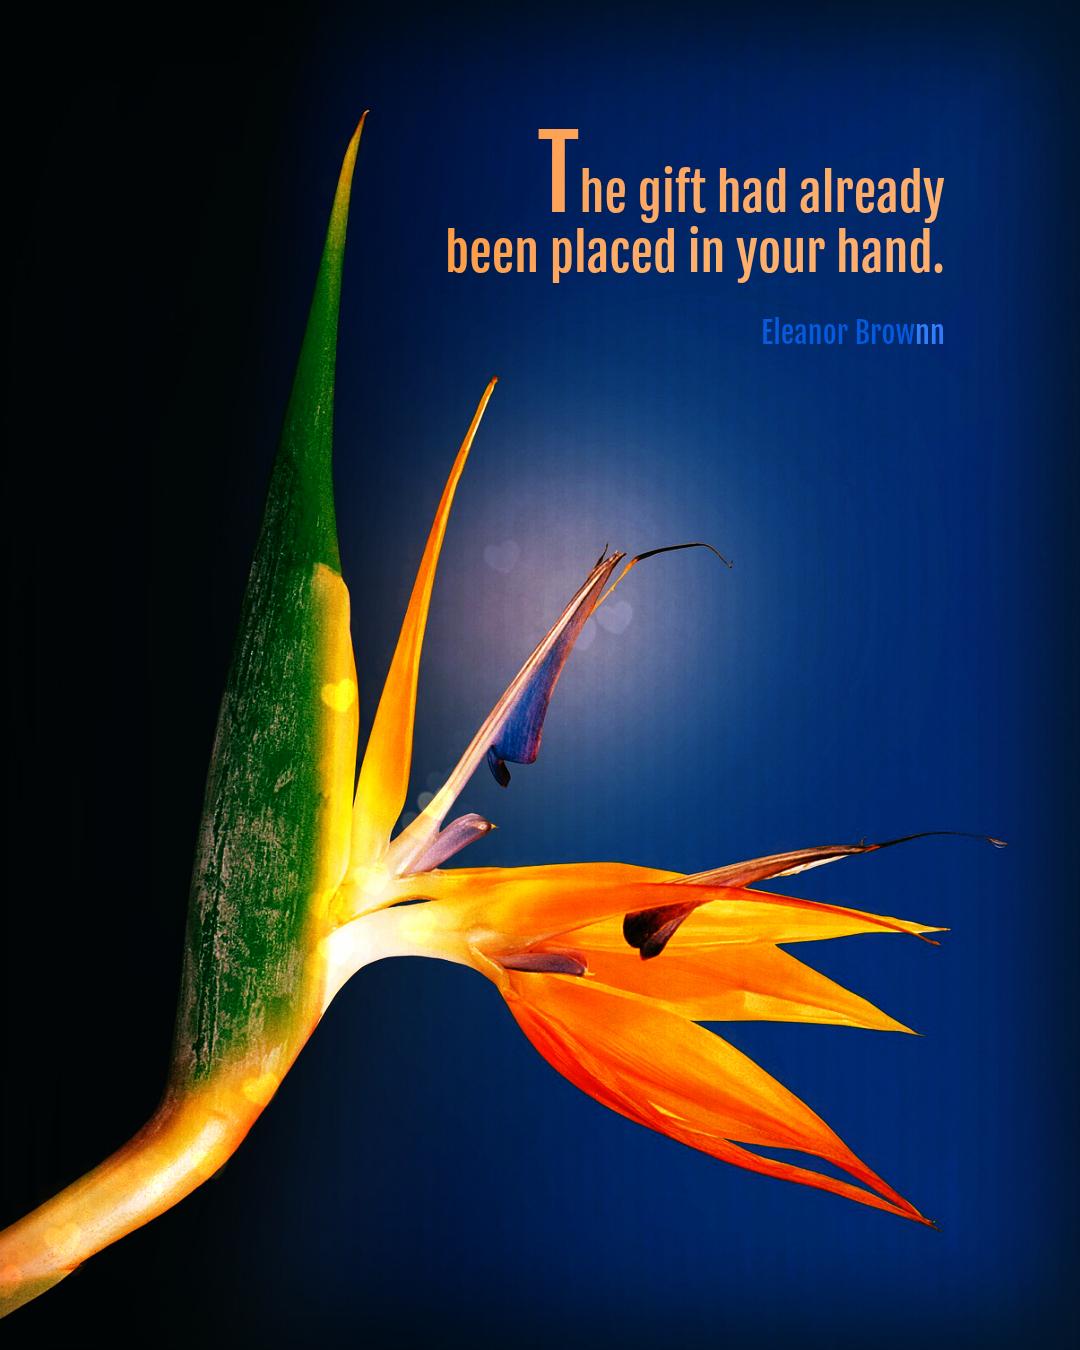 Eleanor-Brownn-Unopened-Gifts